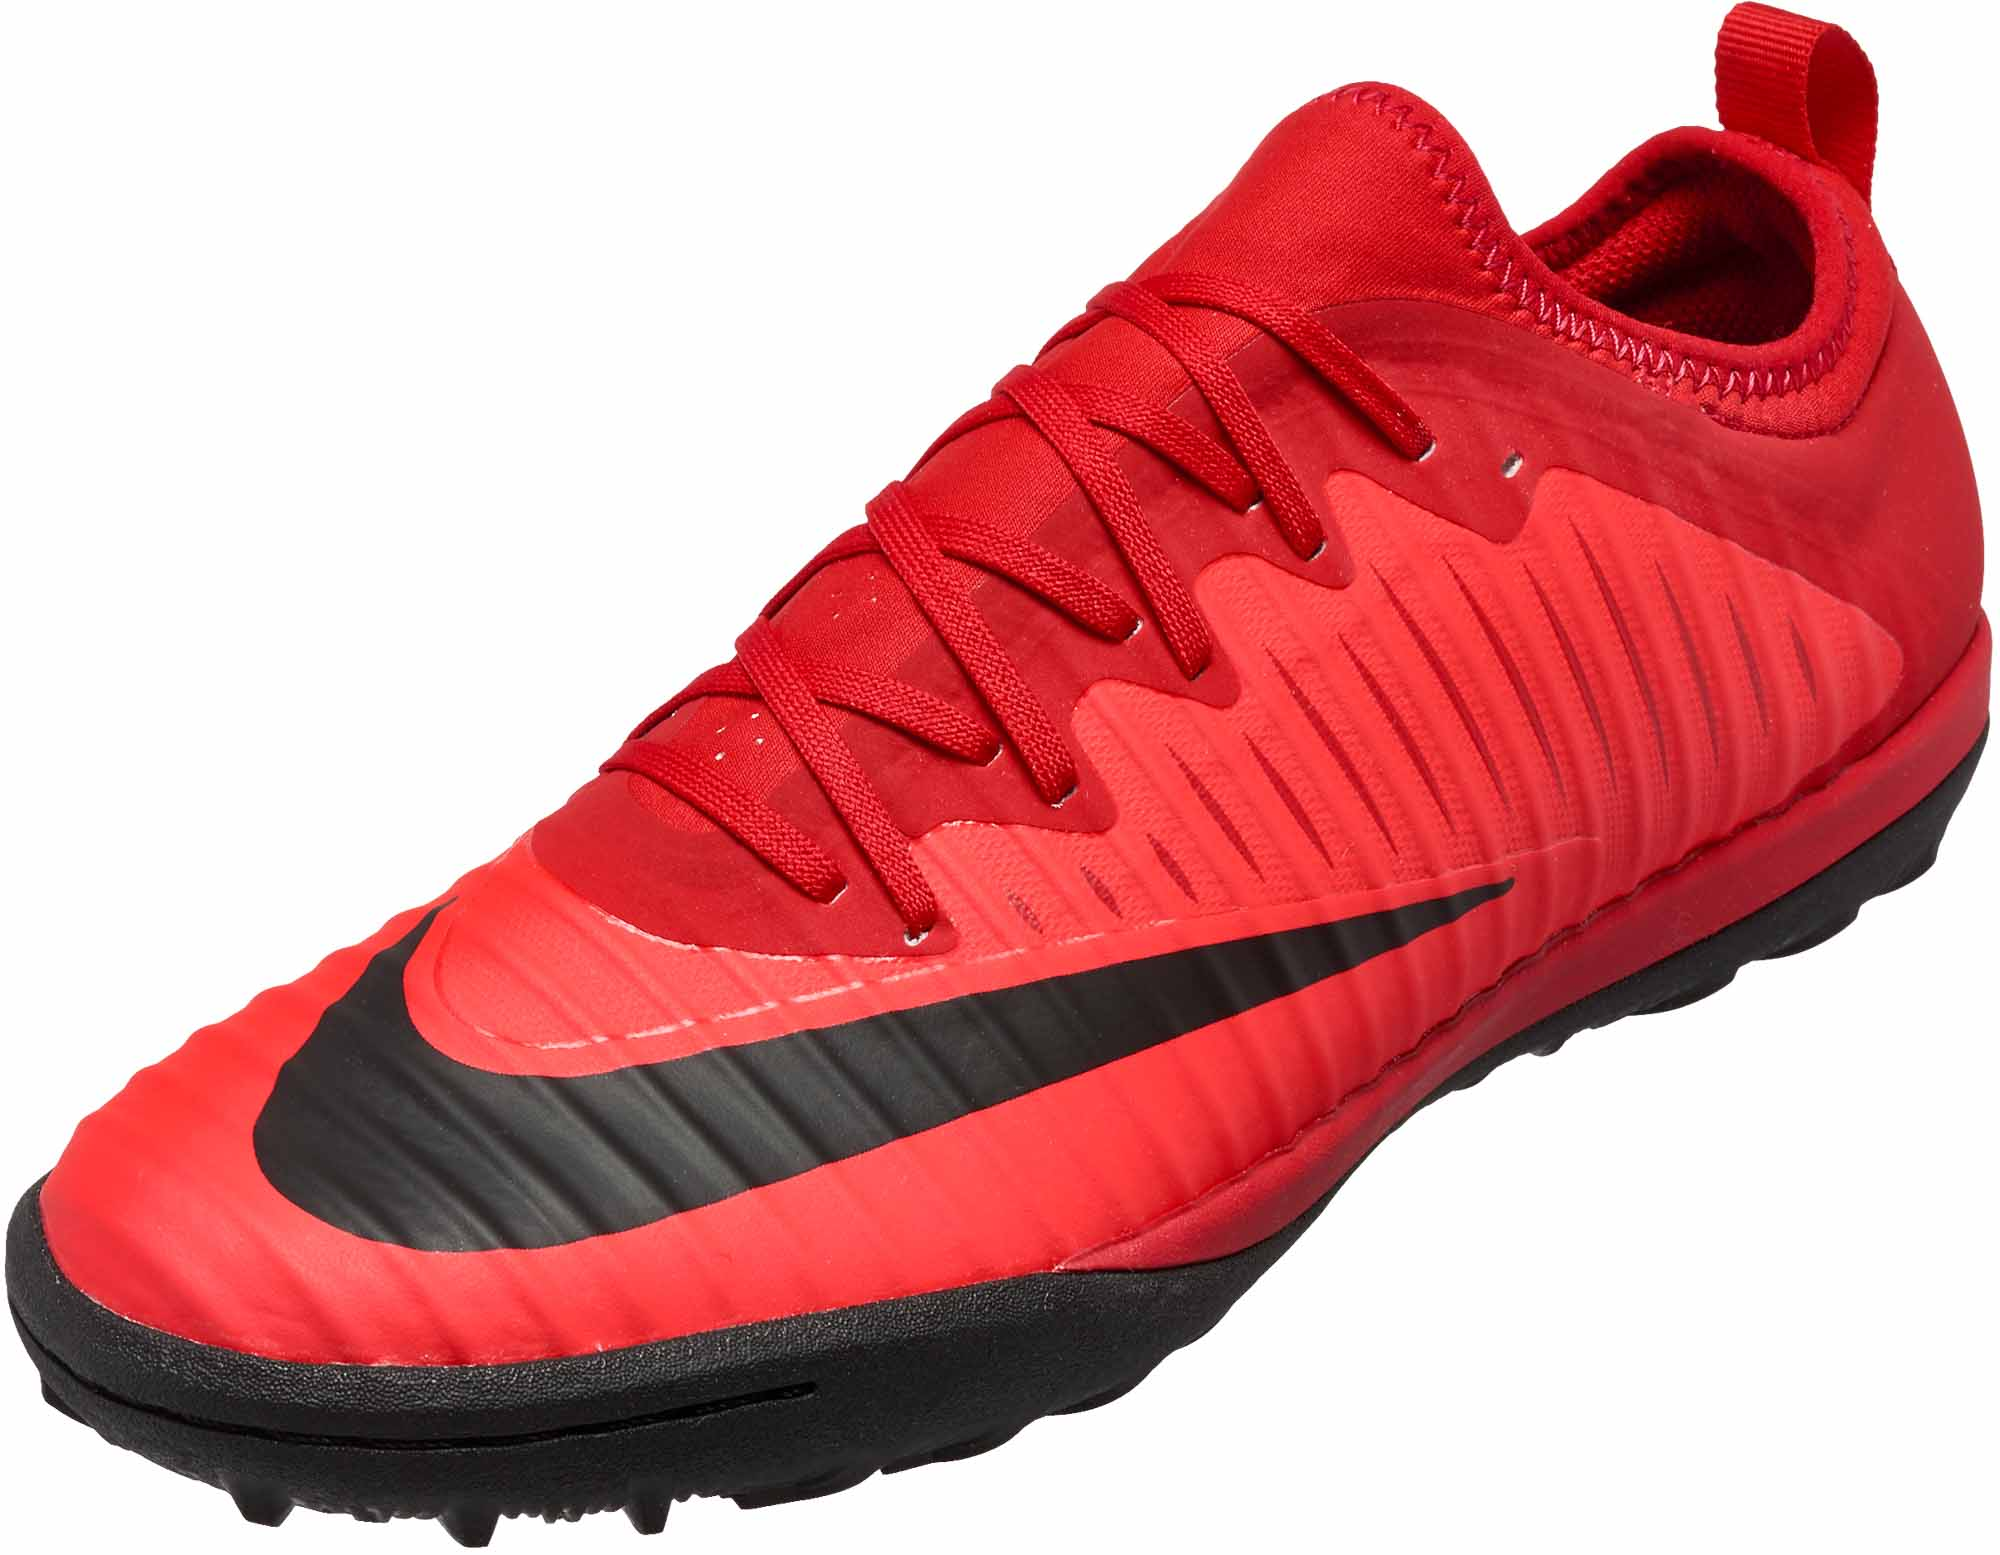 info for f479f ed75d Nike MercurialX Finale II TF – University Red/Black